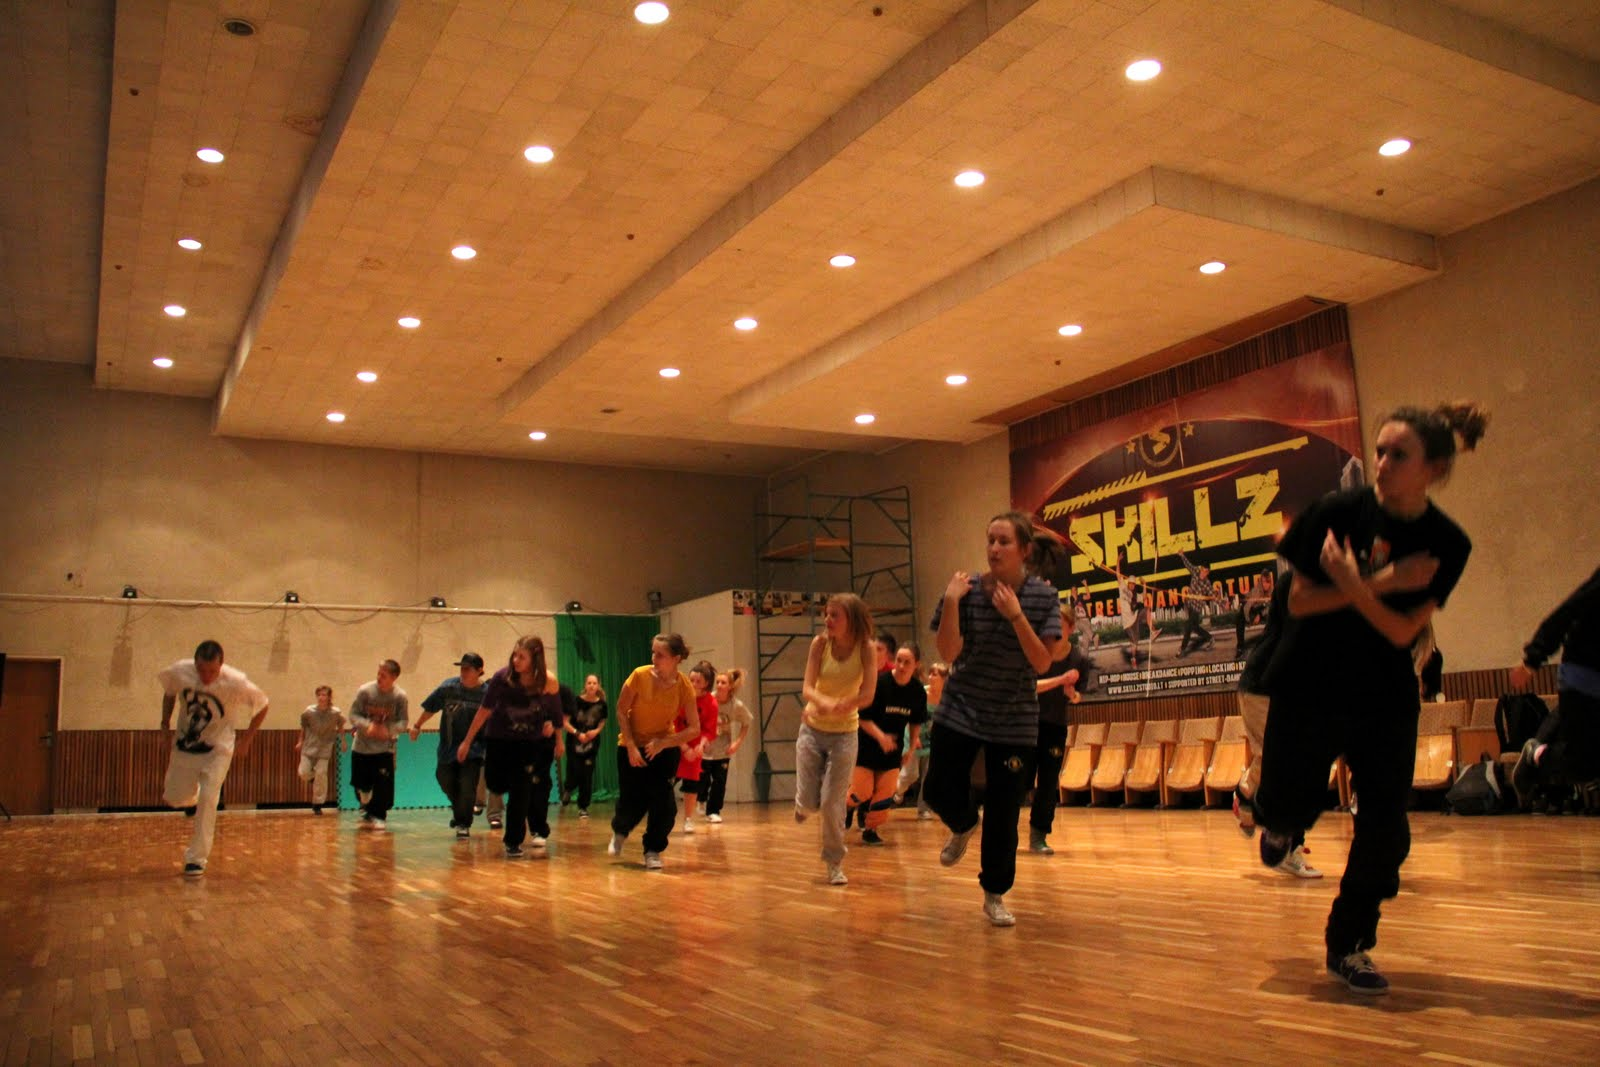 Dre10 Workshop @SKILLZ - IMG_5606.JPG